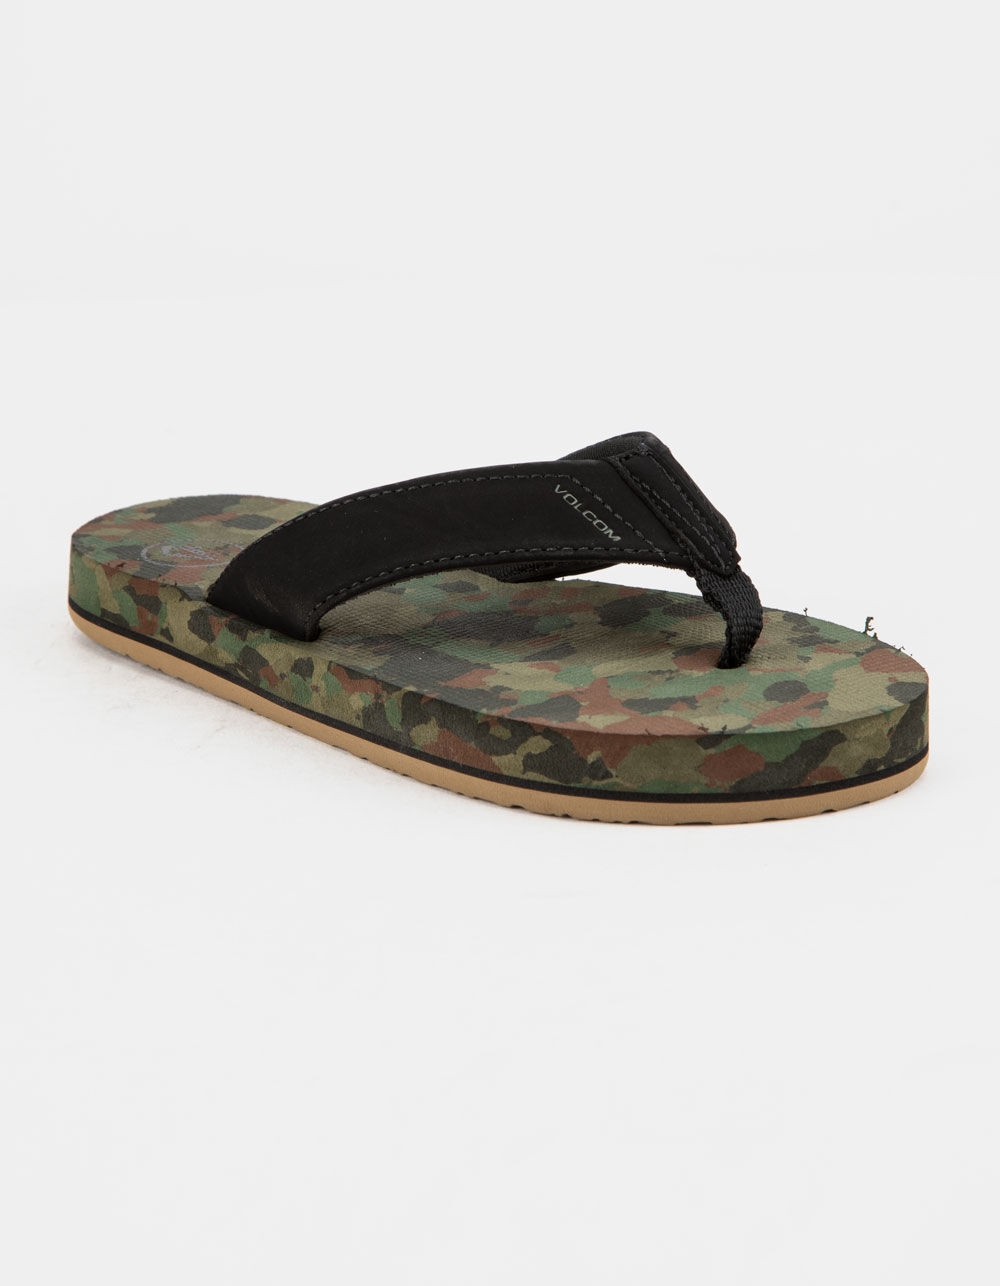 VOLCOM Victor Dark Camo Boys Sandals